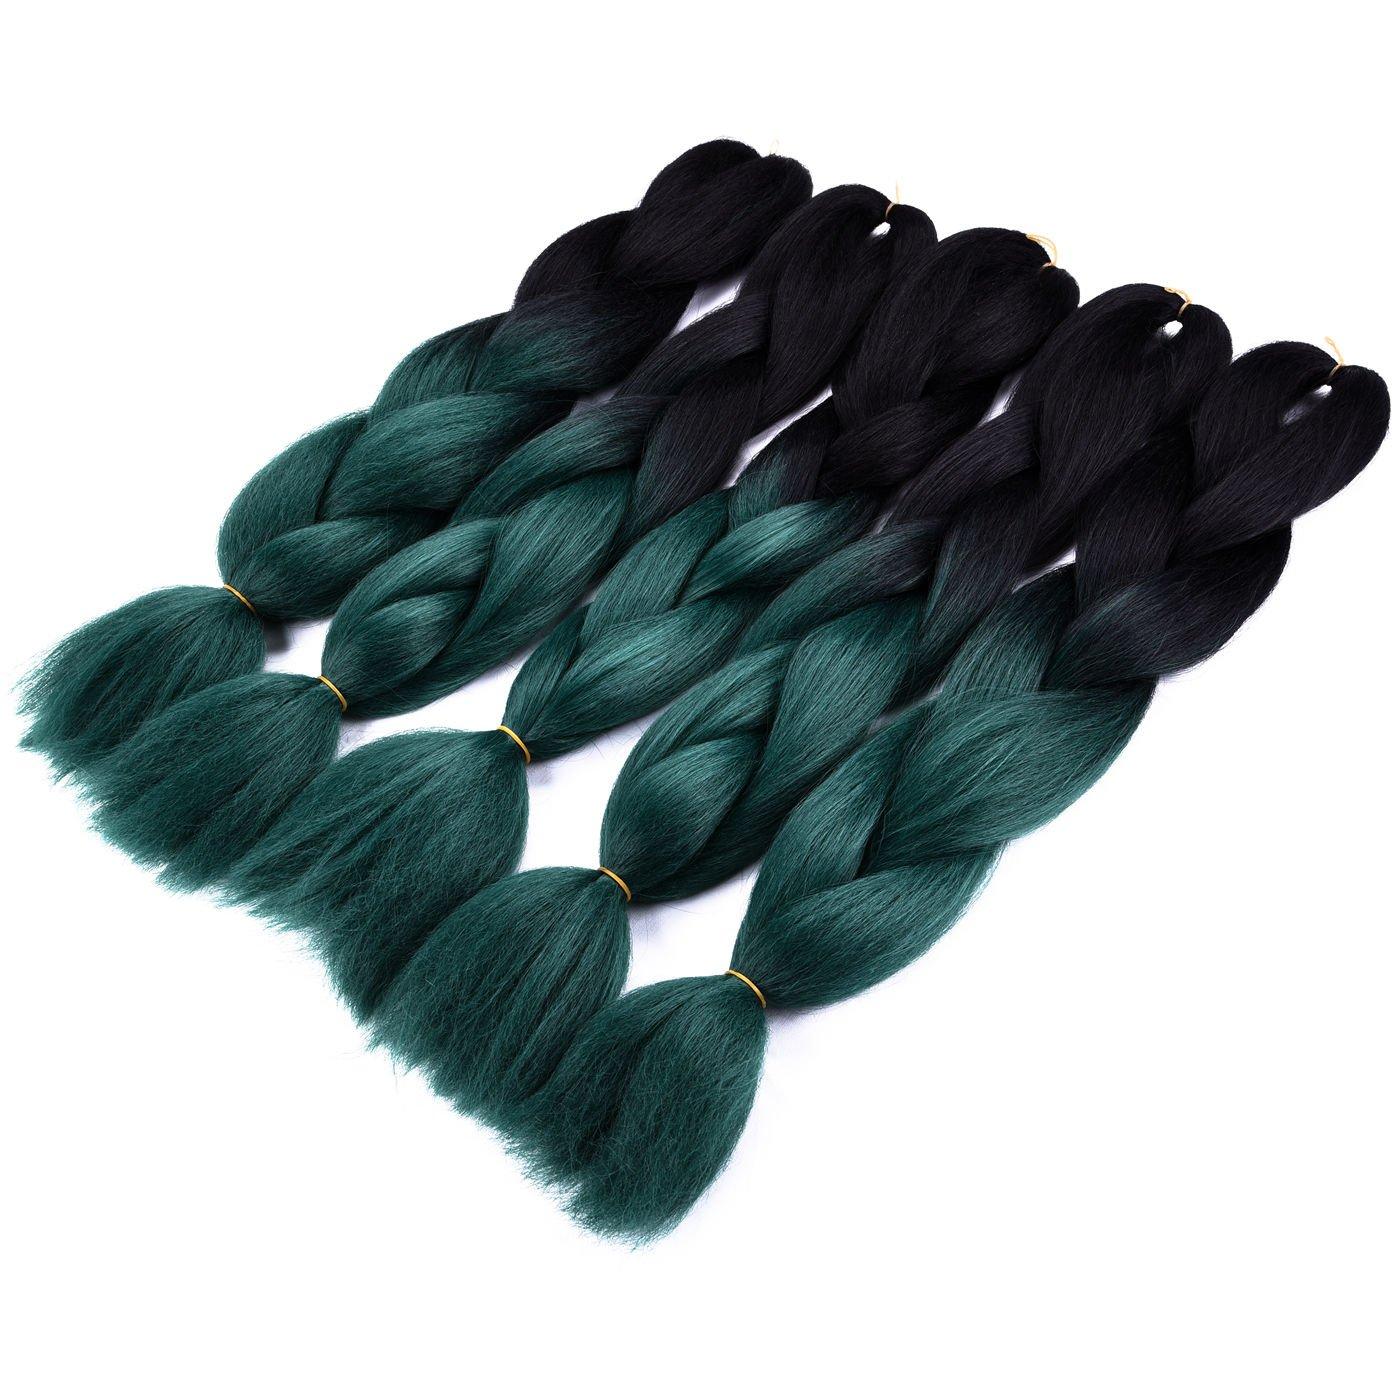 Silike Jumbo Braids Hair Extensions (5 Pieces) 24'' Ombre Jumbo Braid Kanekalon Hair For Beauty (Black/Dark Green)